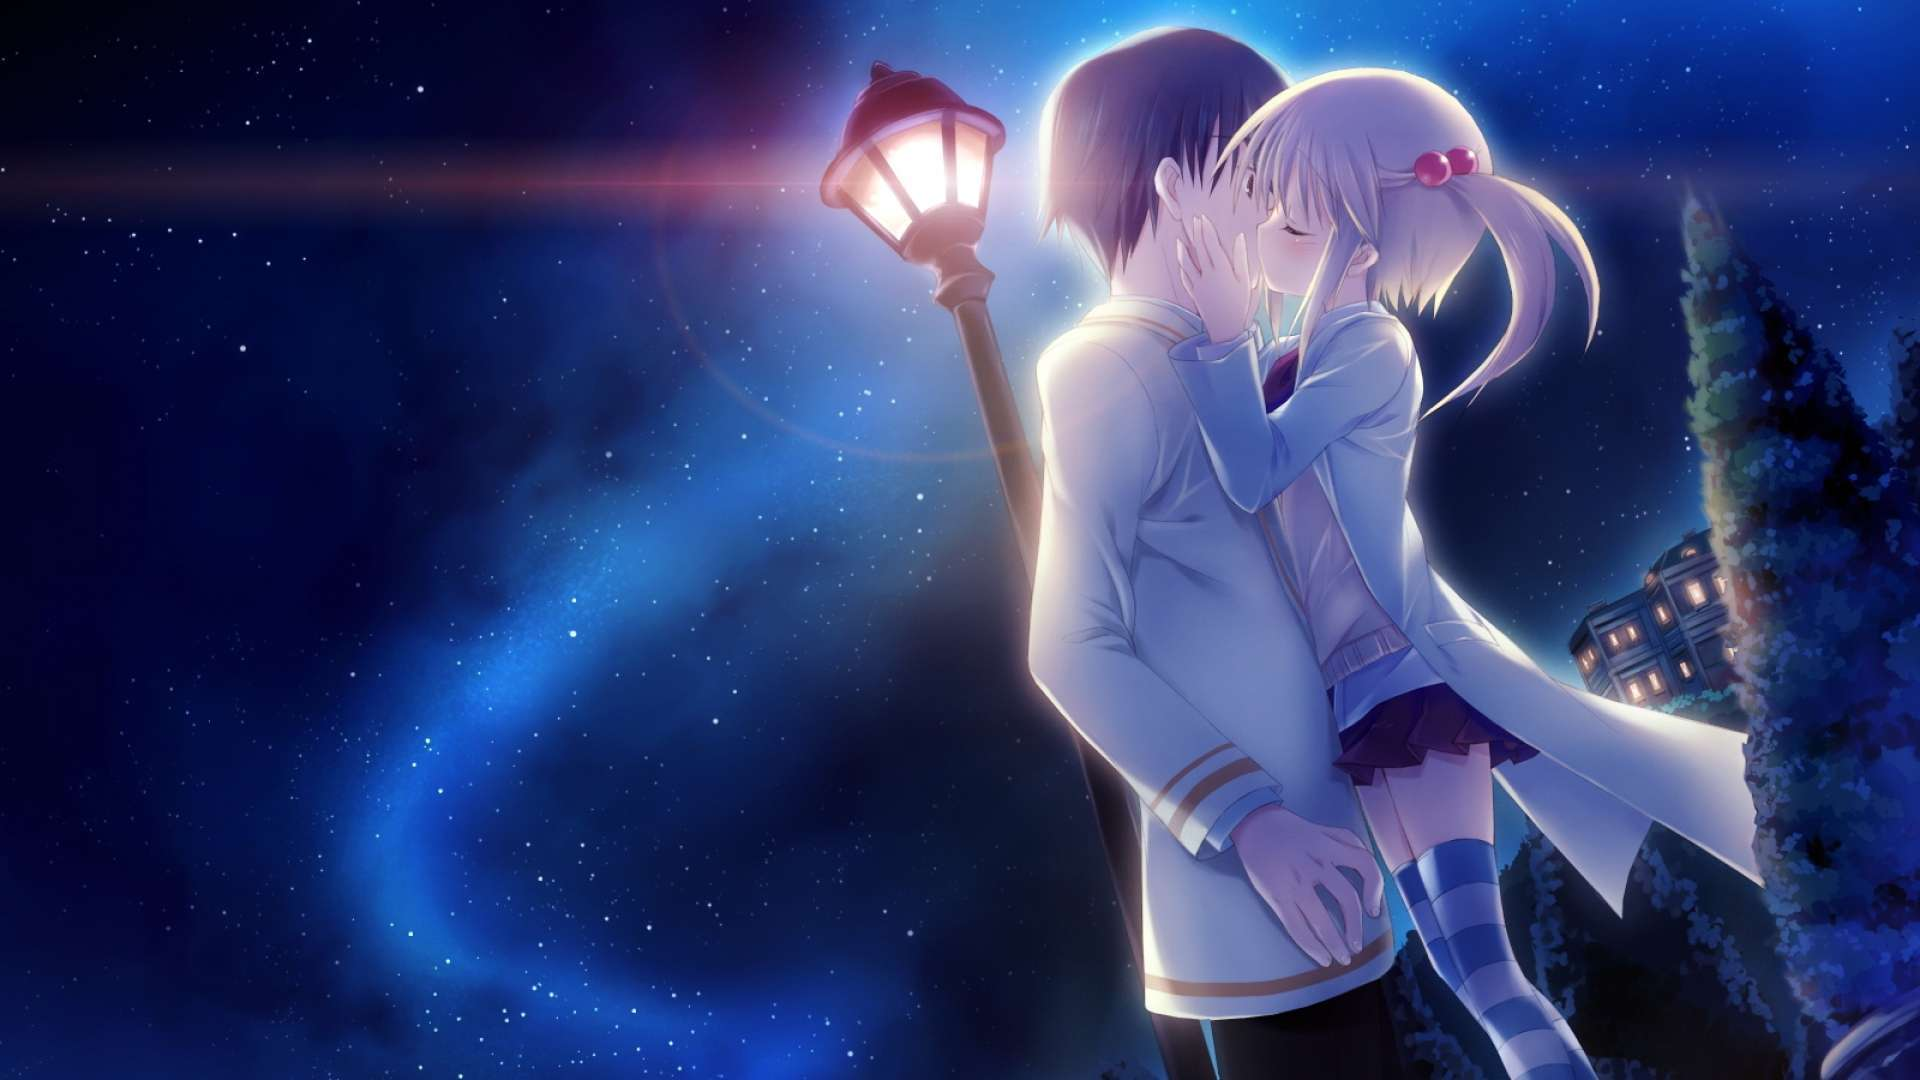 Wallpaper Anime Girl Kissing Boy HD Wallpaper 1080p Upload at 1920x1080